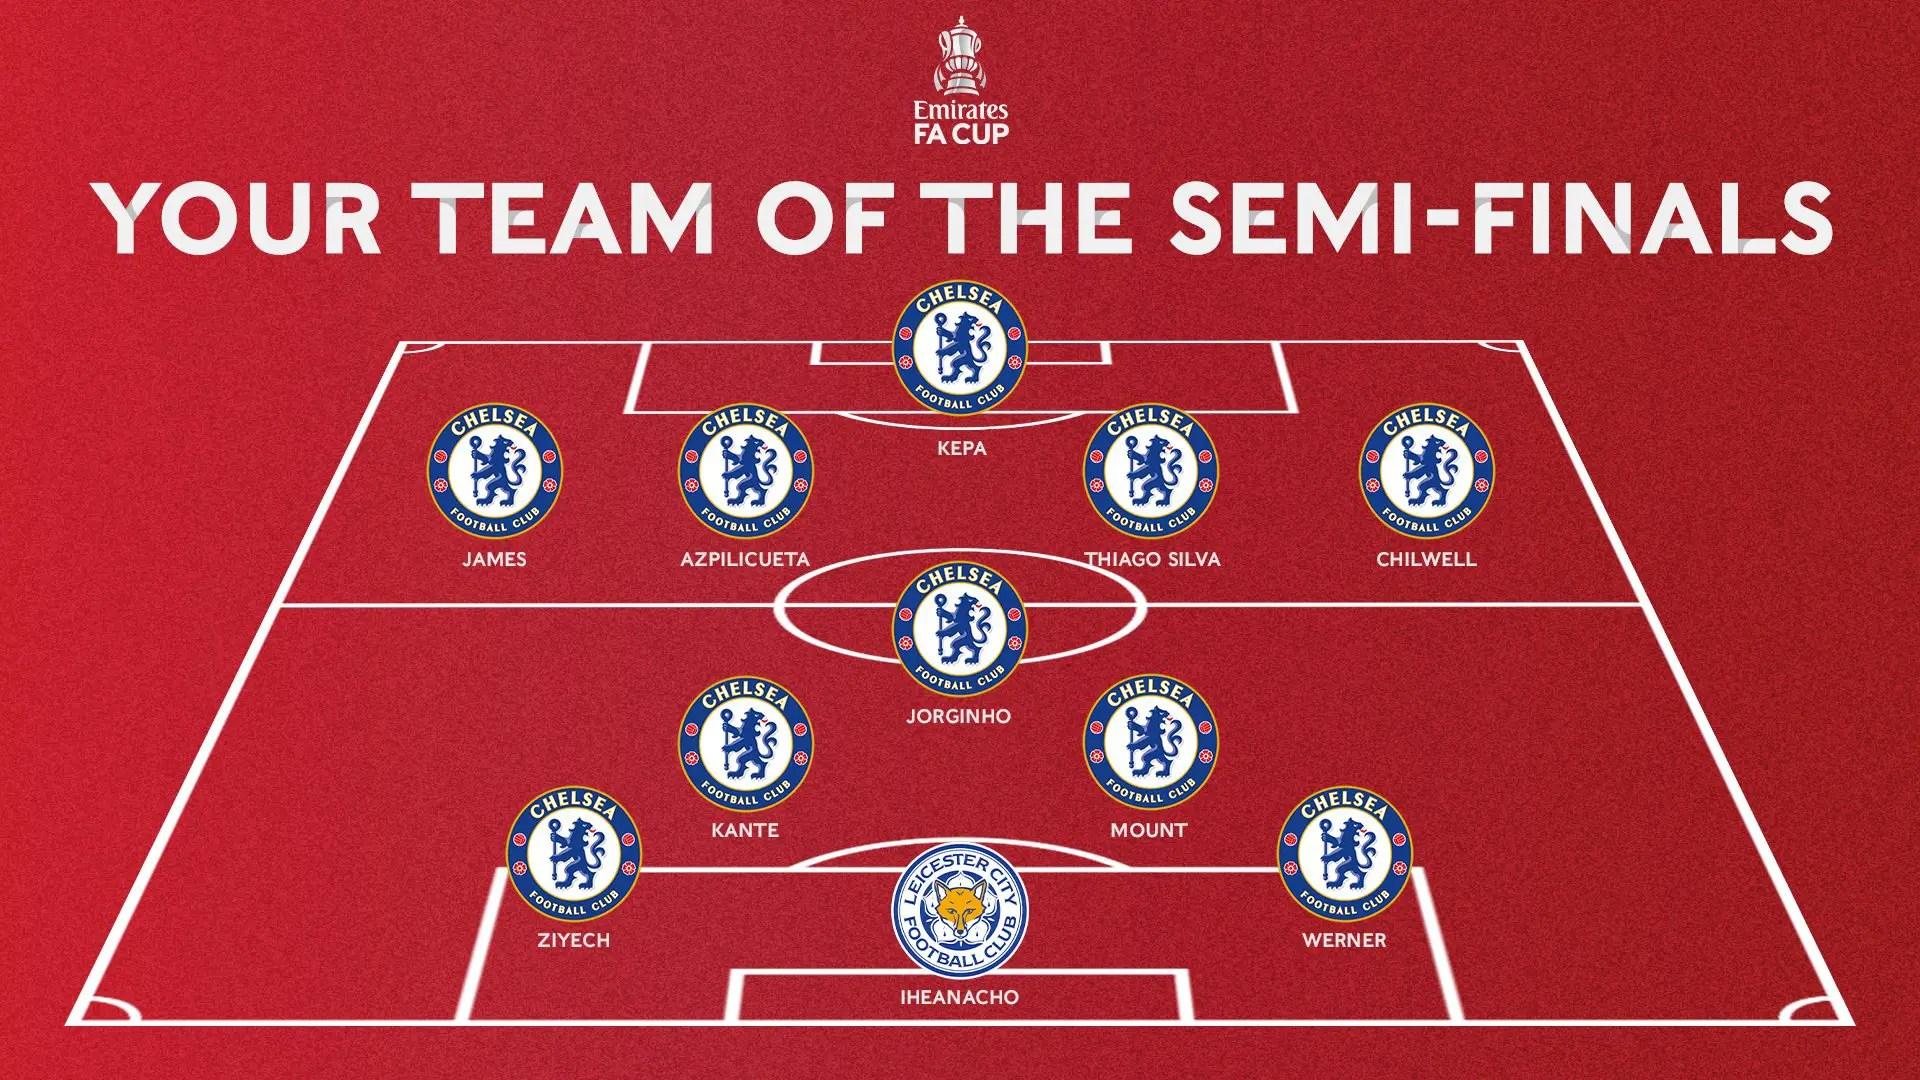 Iheanacho Named In Emirates FA Cup Team Of The Semi-finals